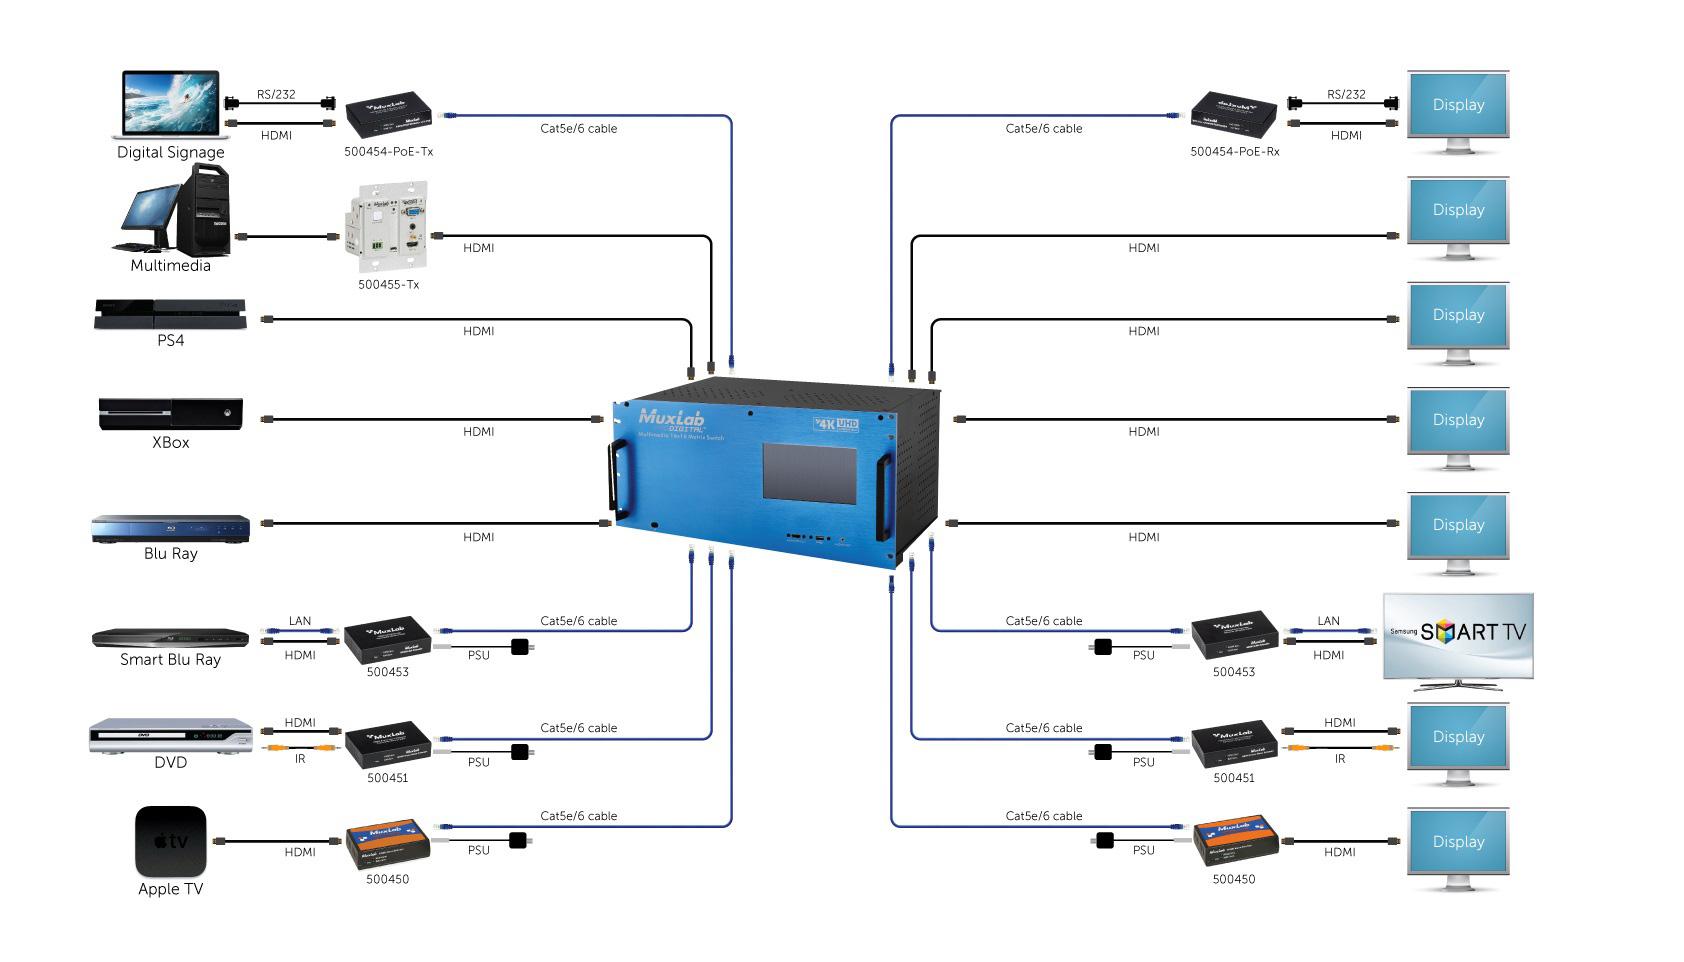 Muxlab 500483 I 4 Channel Hdbt Input Card Poe Uhd 4k Cat5e Wire Diagram